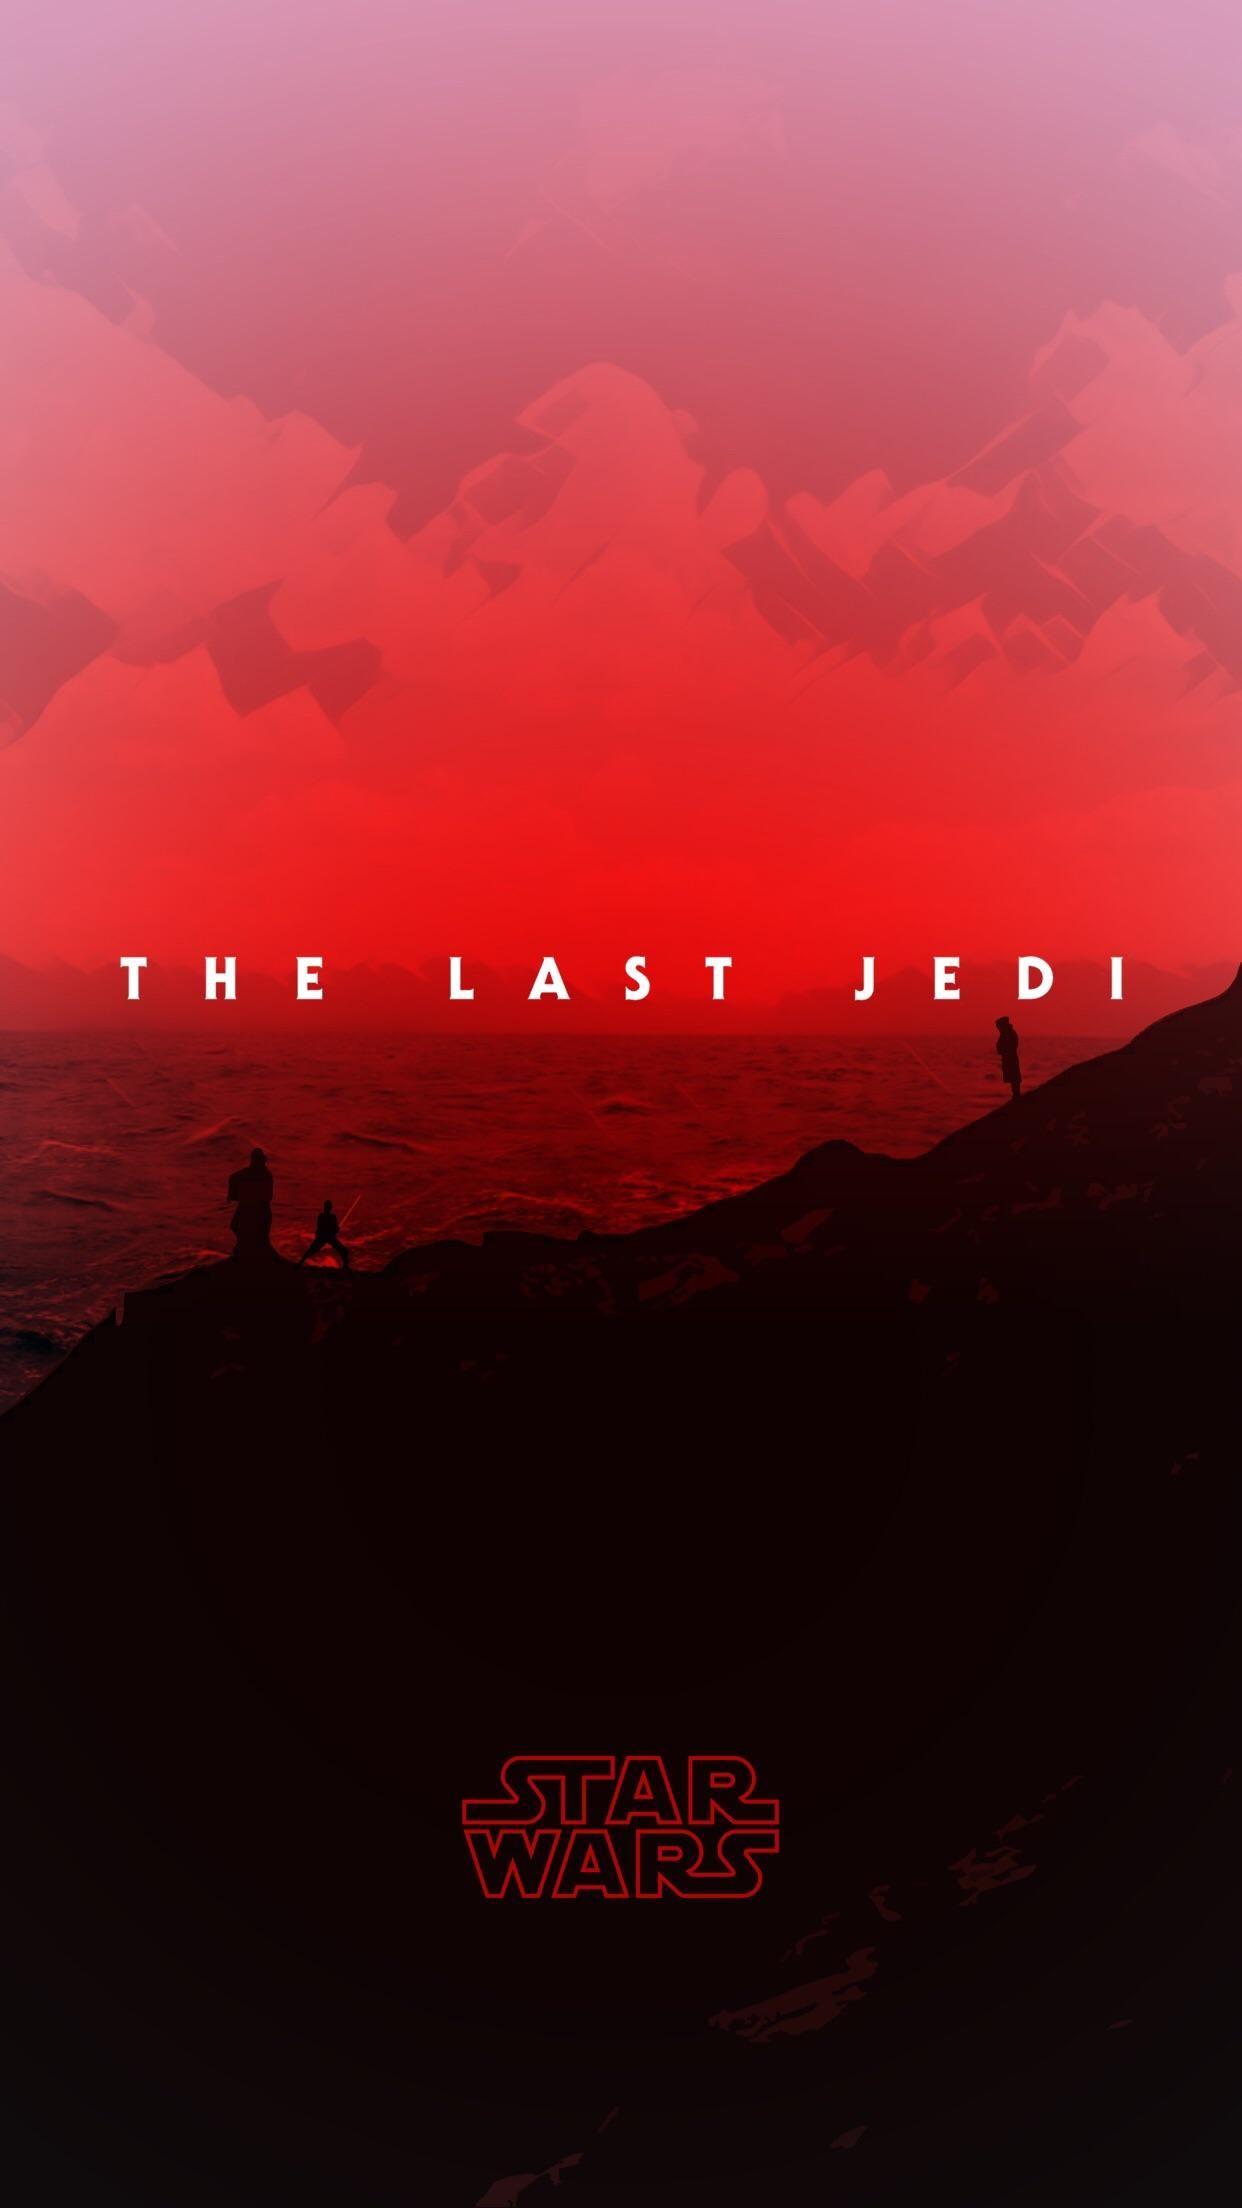 The Last Jedi Hd Wallpaper From Gallsource Star Wars The Last